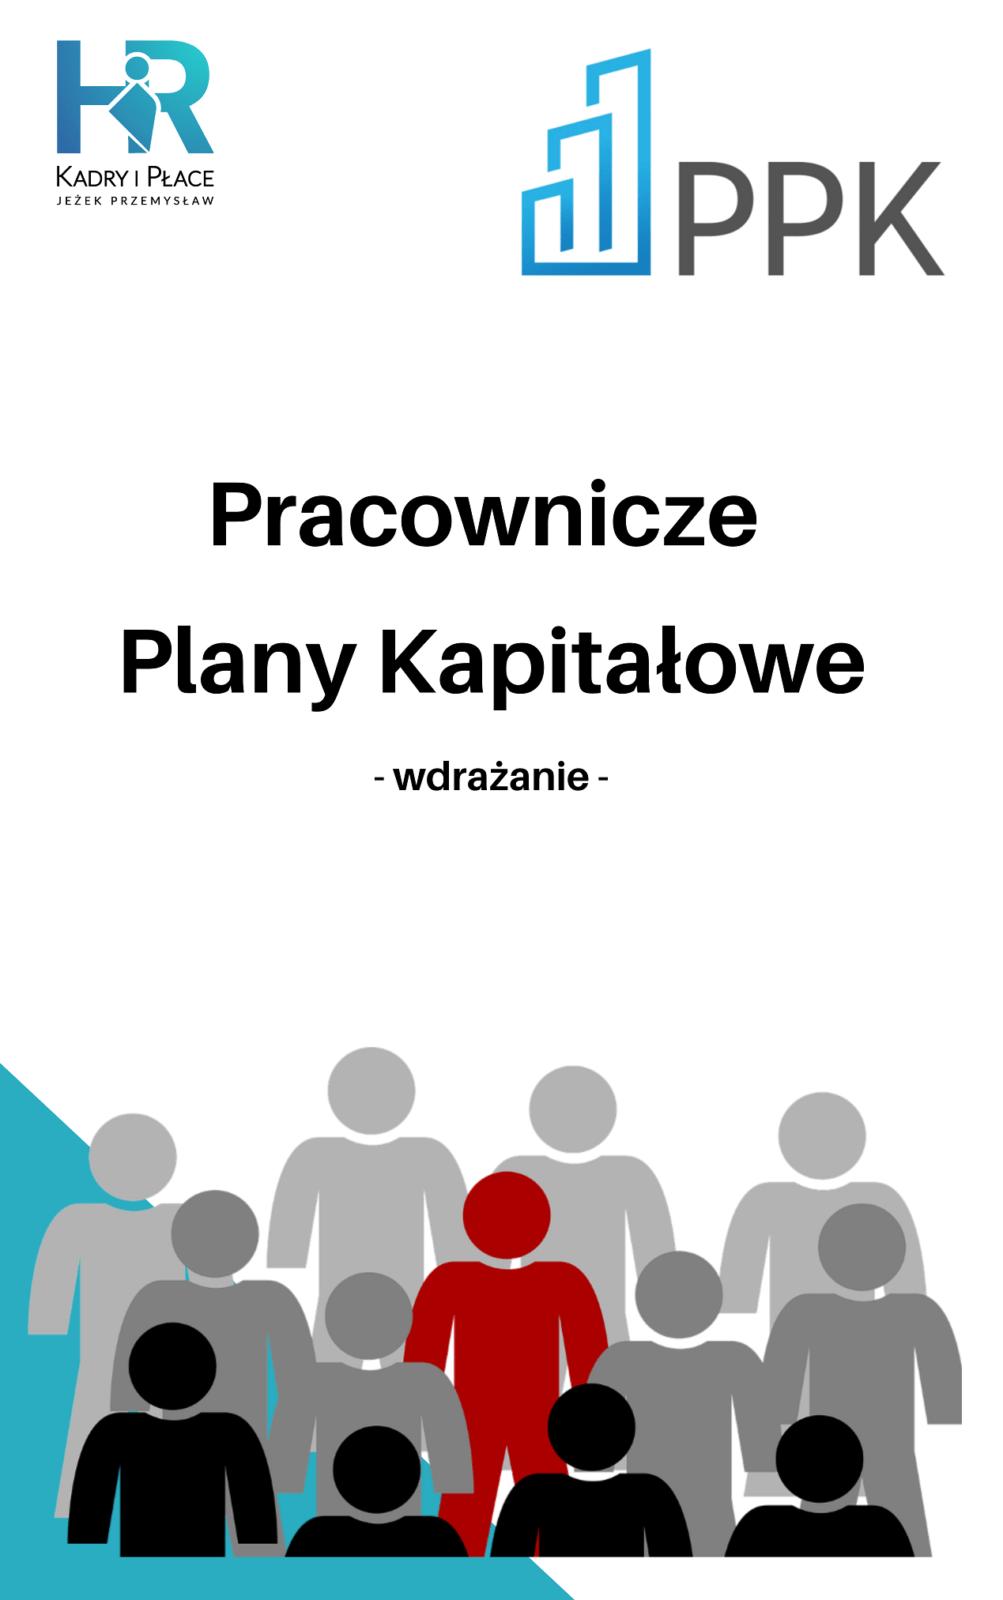 pracownicze plany kapitałowe PPK